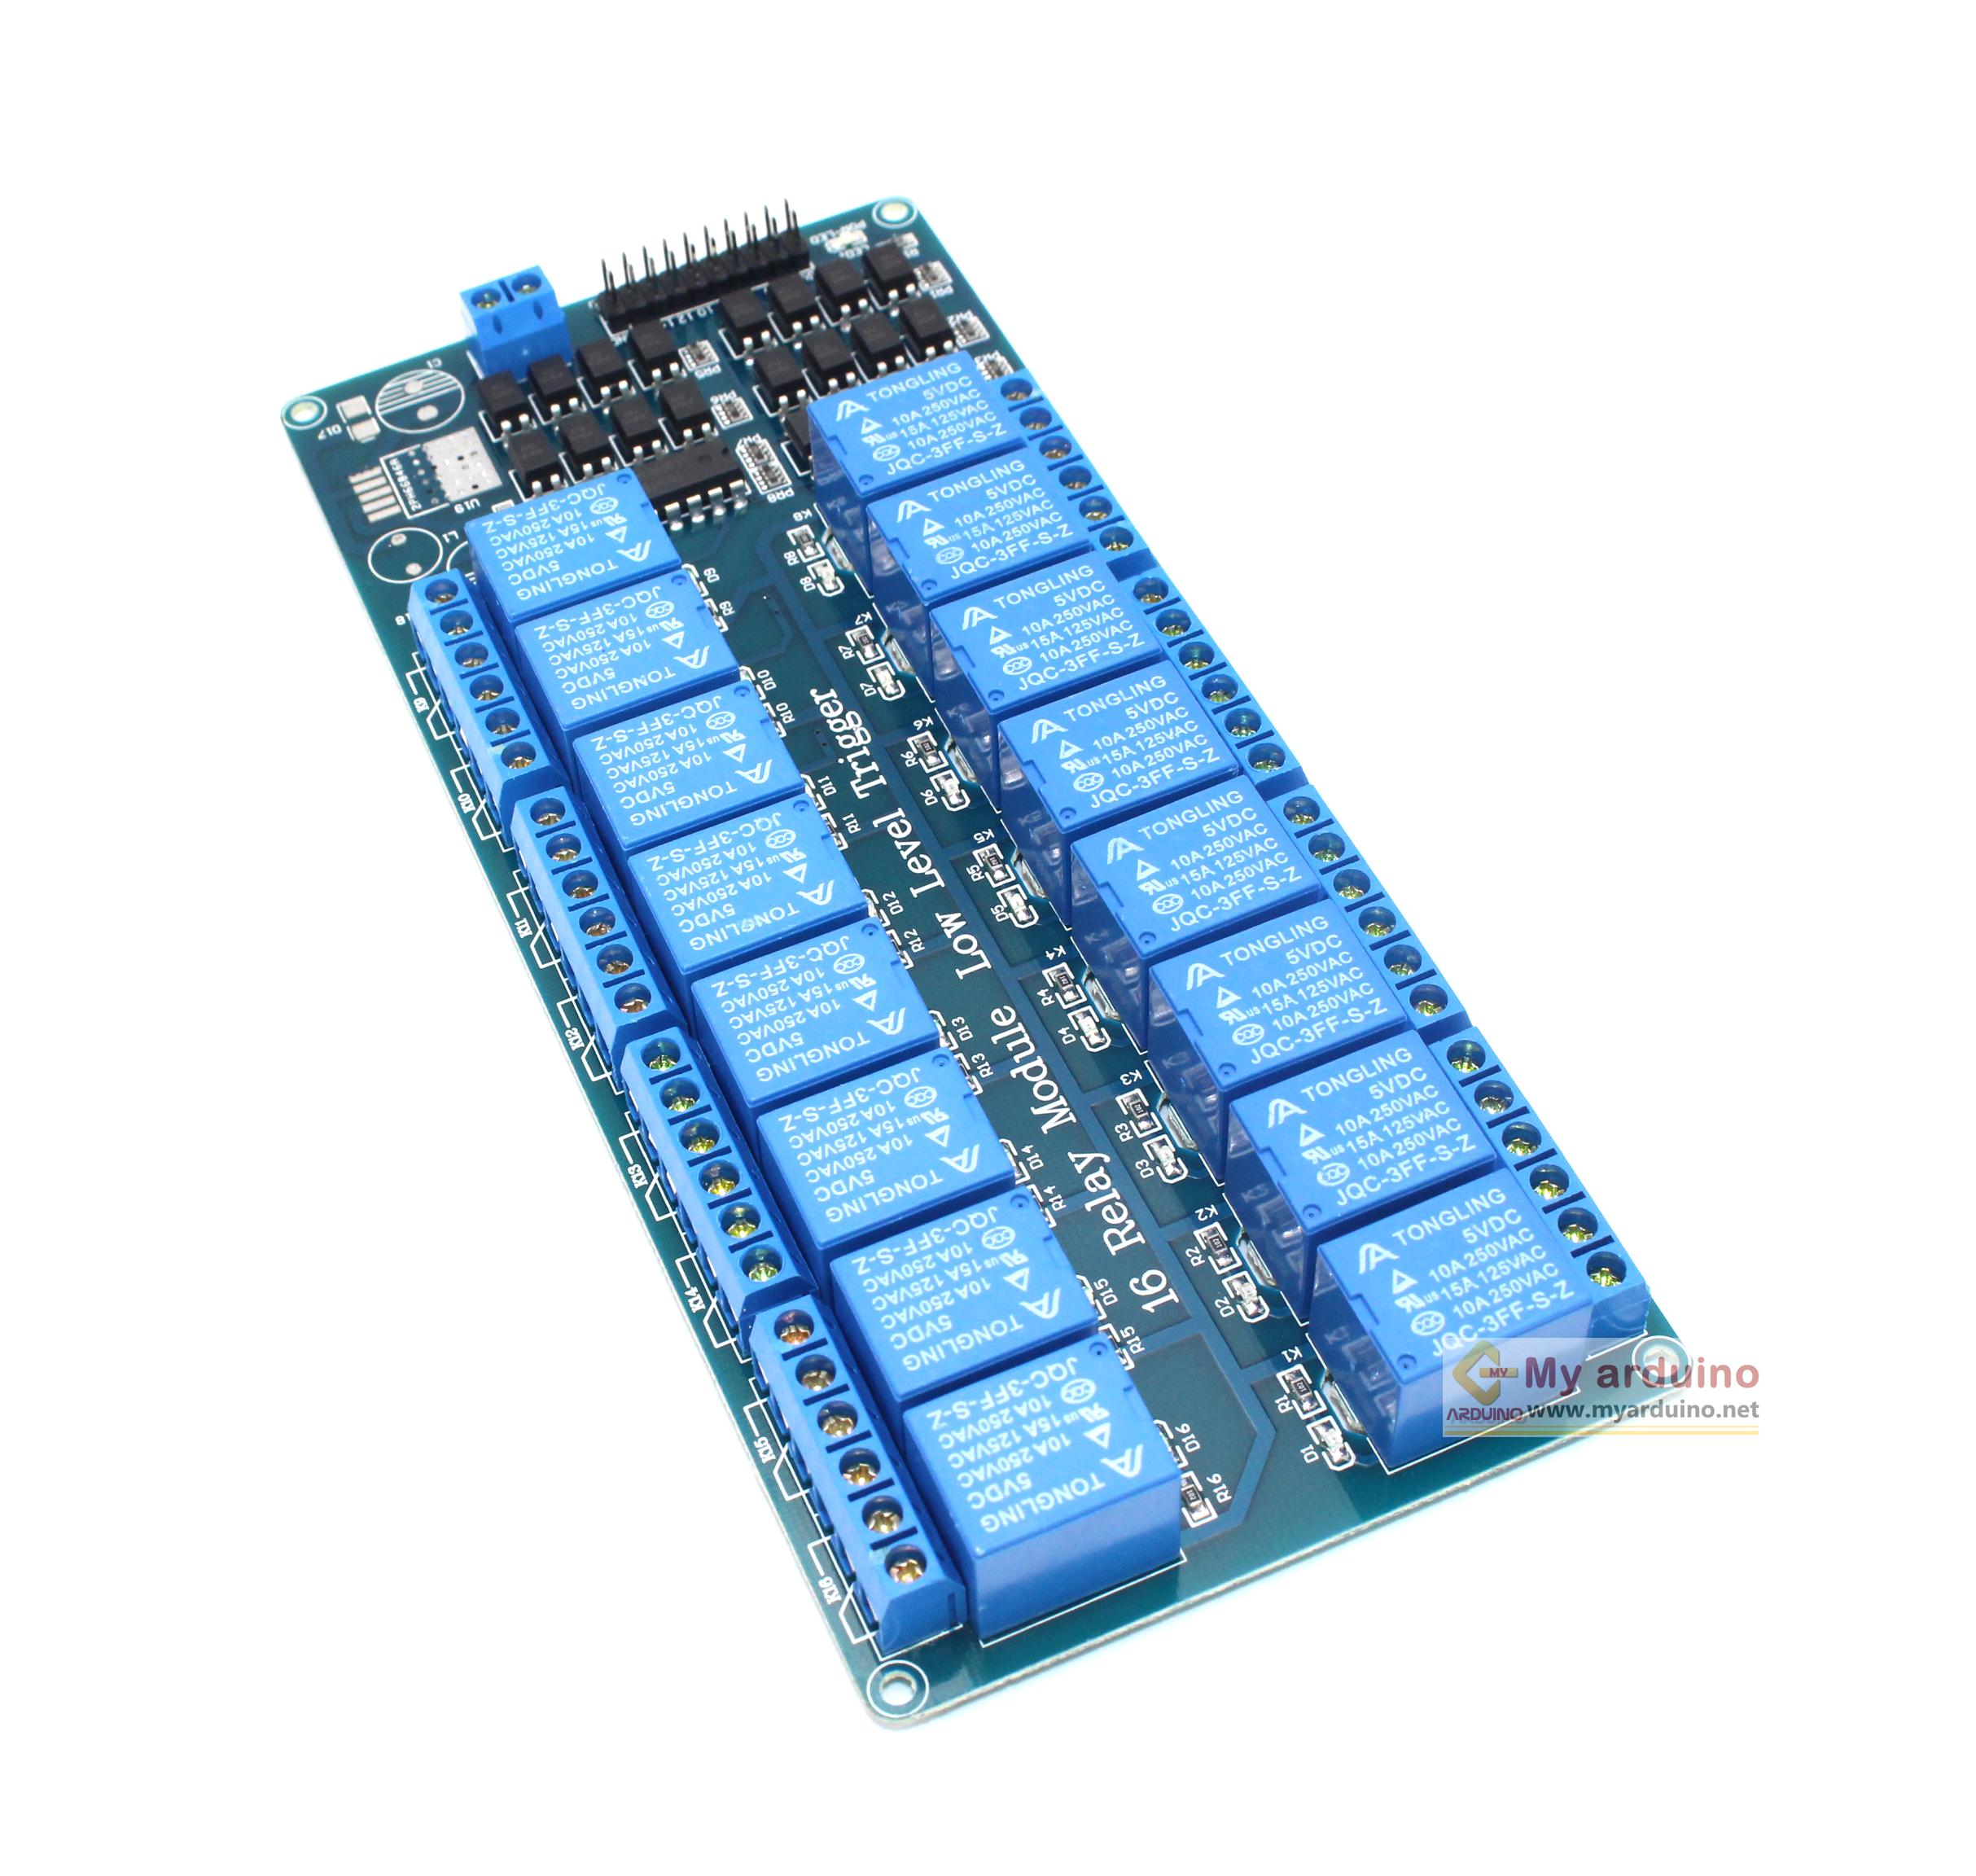 Relay Module 5V 16 Channel control Relay Module Shield